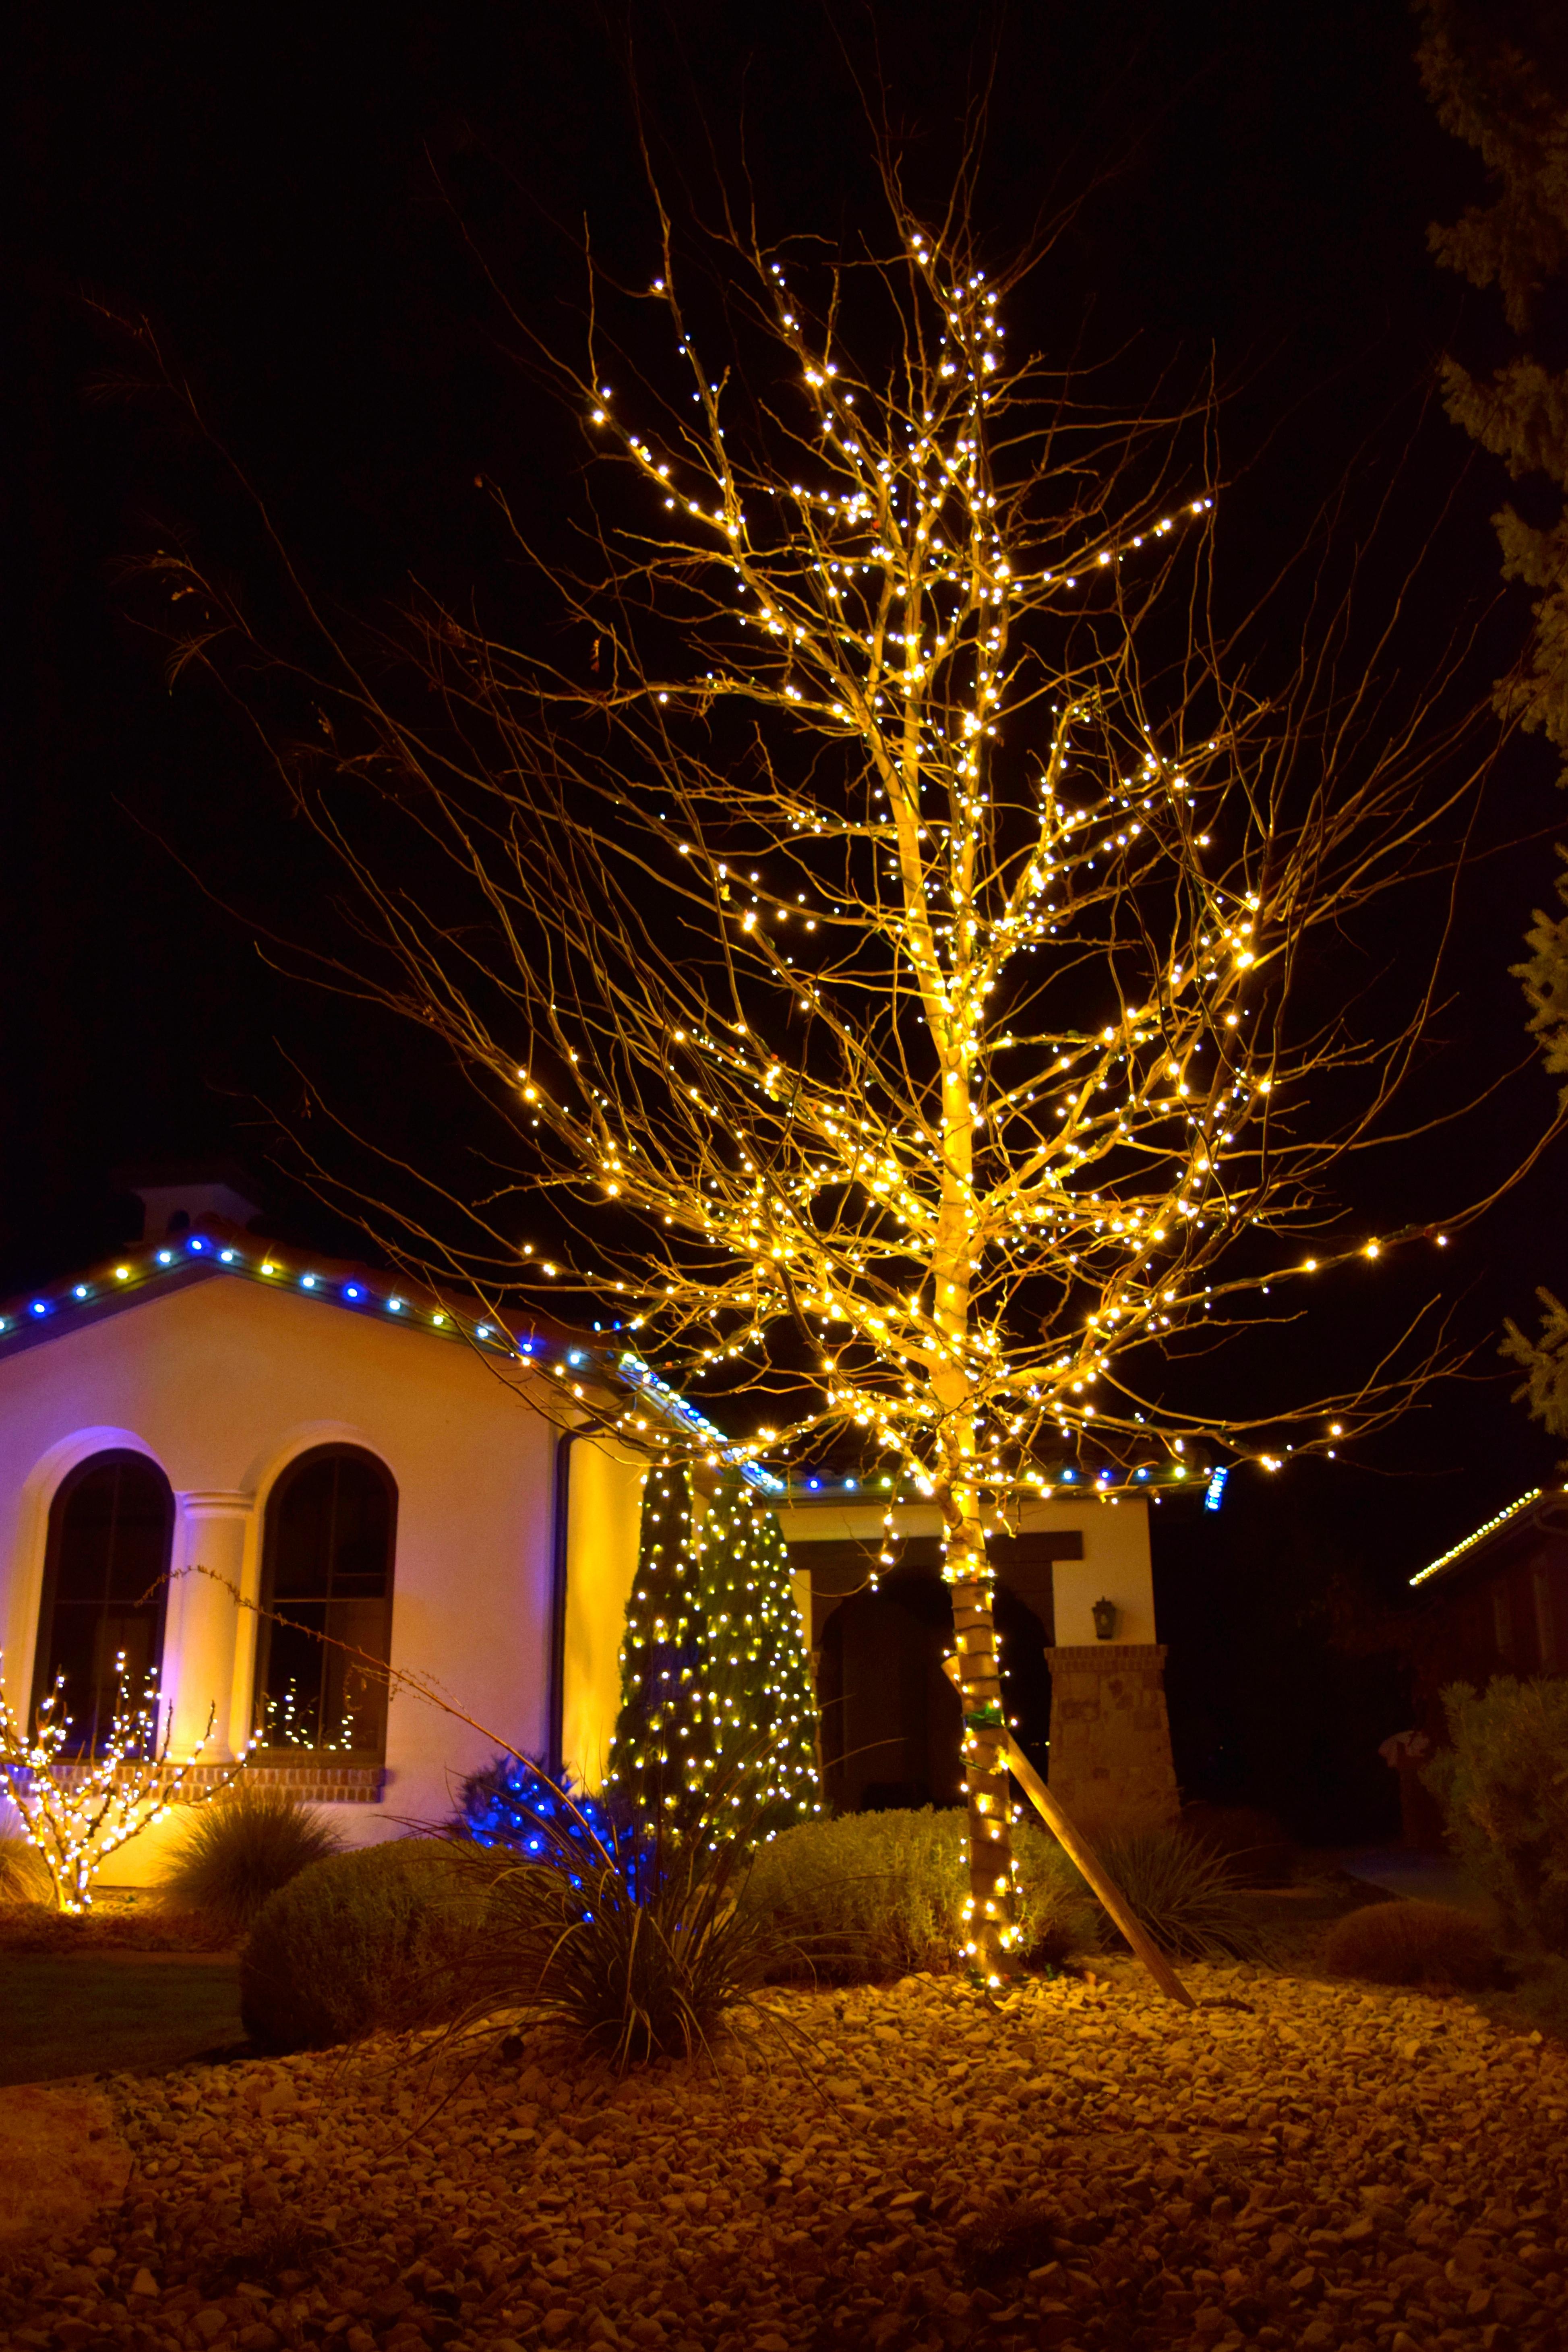 LED Christmas Lights - Warm White Full Wrap Tree